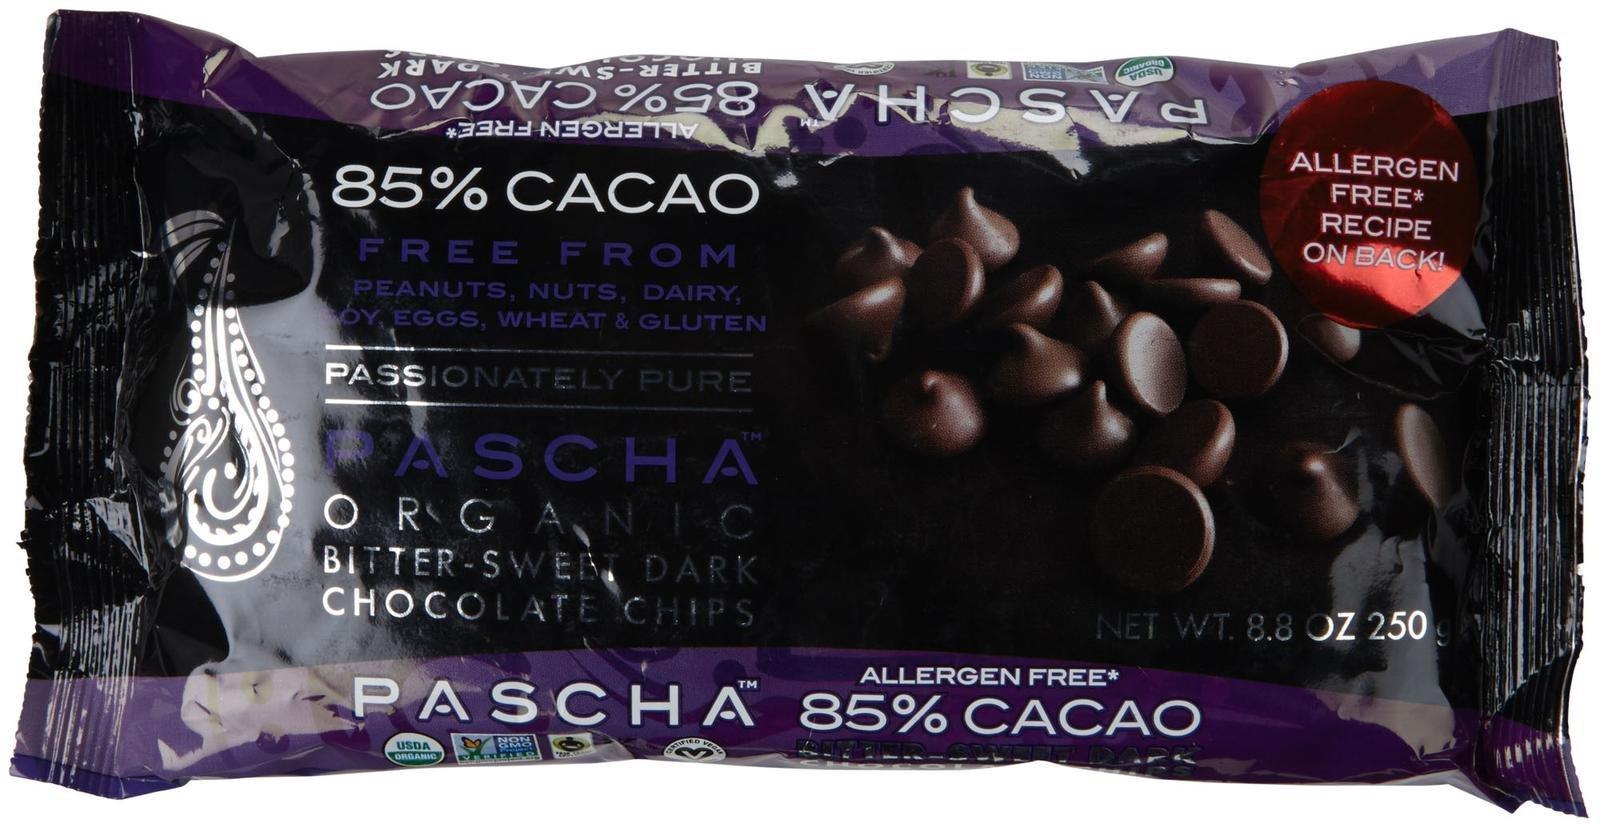 PASCHA Organic Dark Chocolate Baking Chips - 85% Cacao, Bitter-Sweet - 8.8 oz